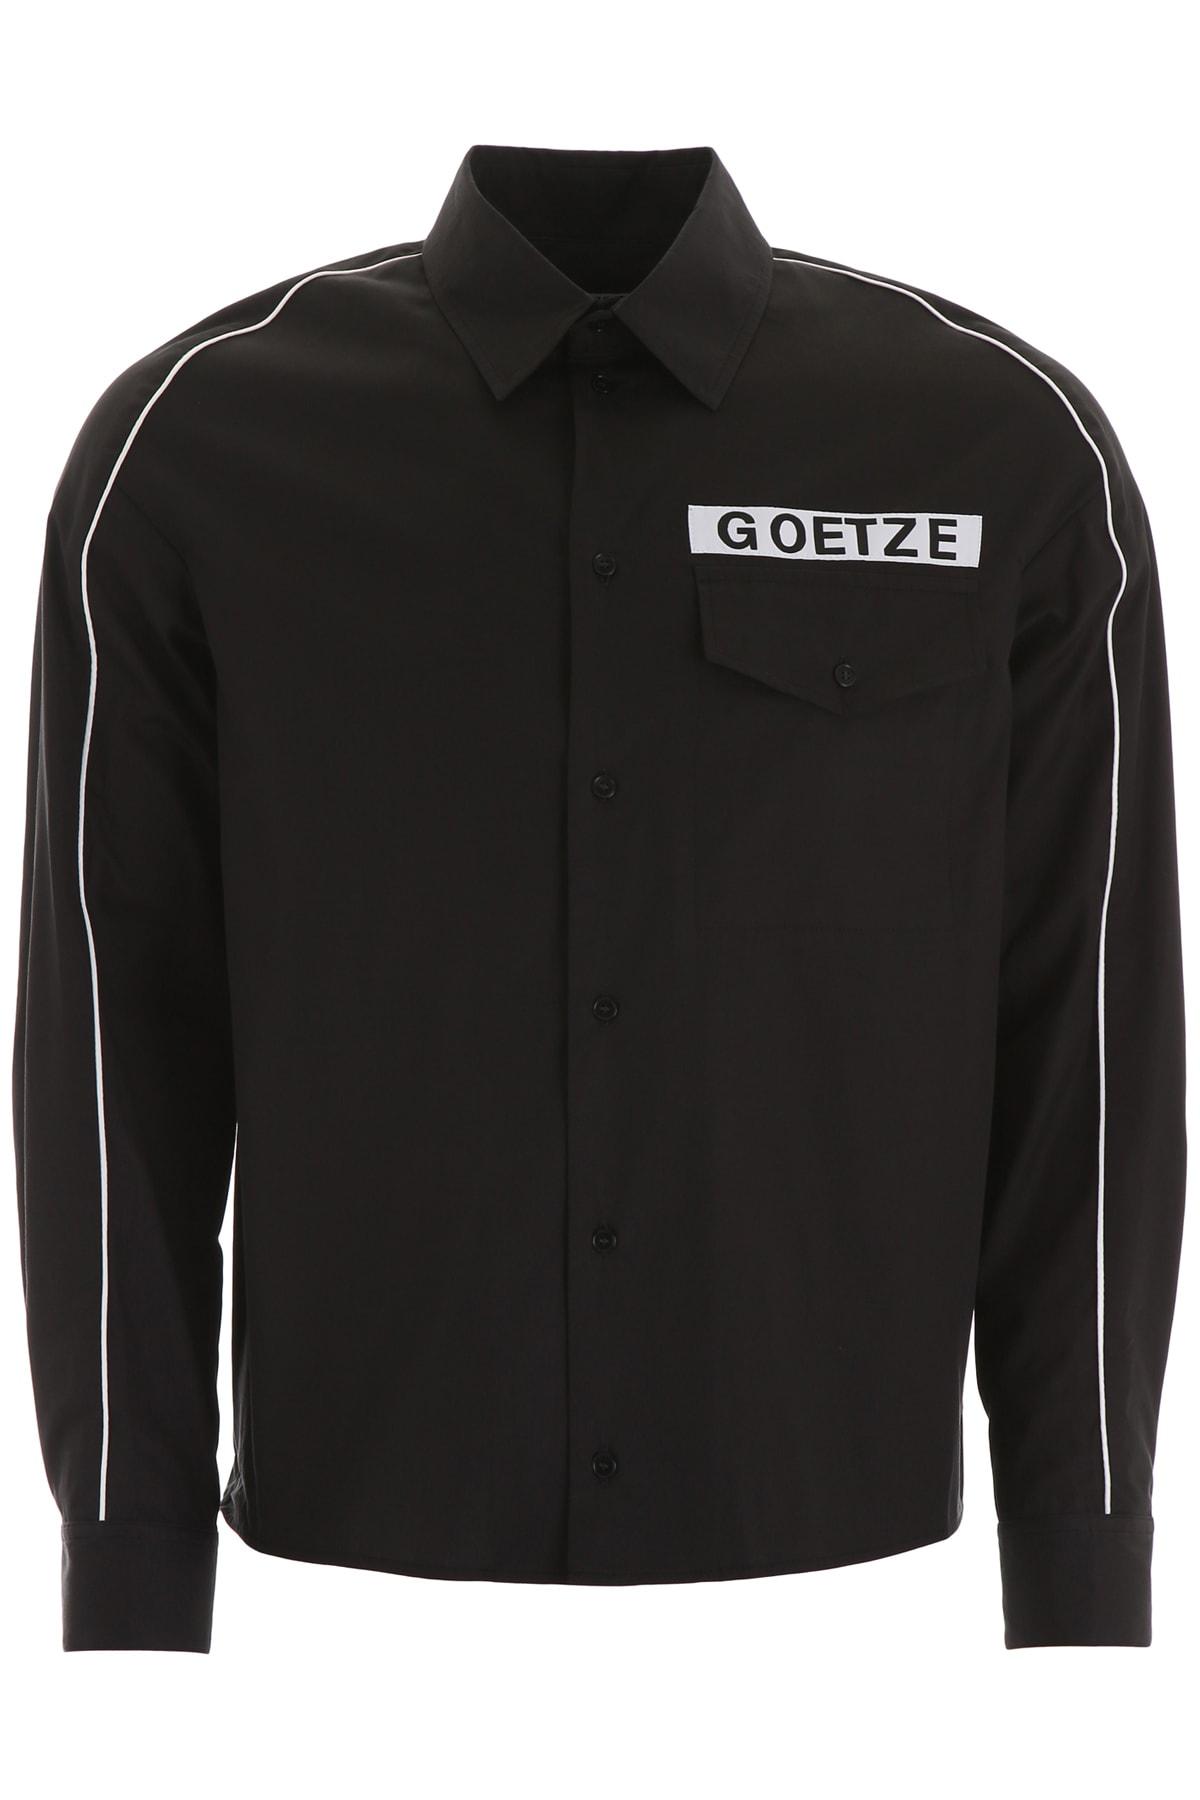 Goetze Vince Shirt